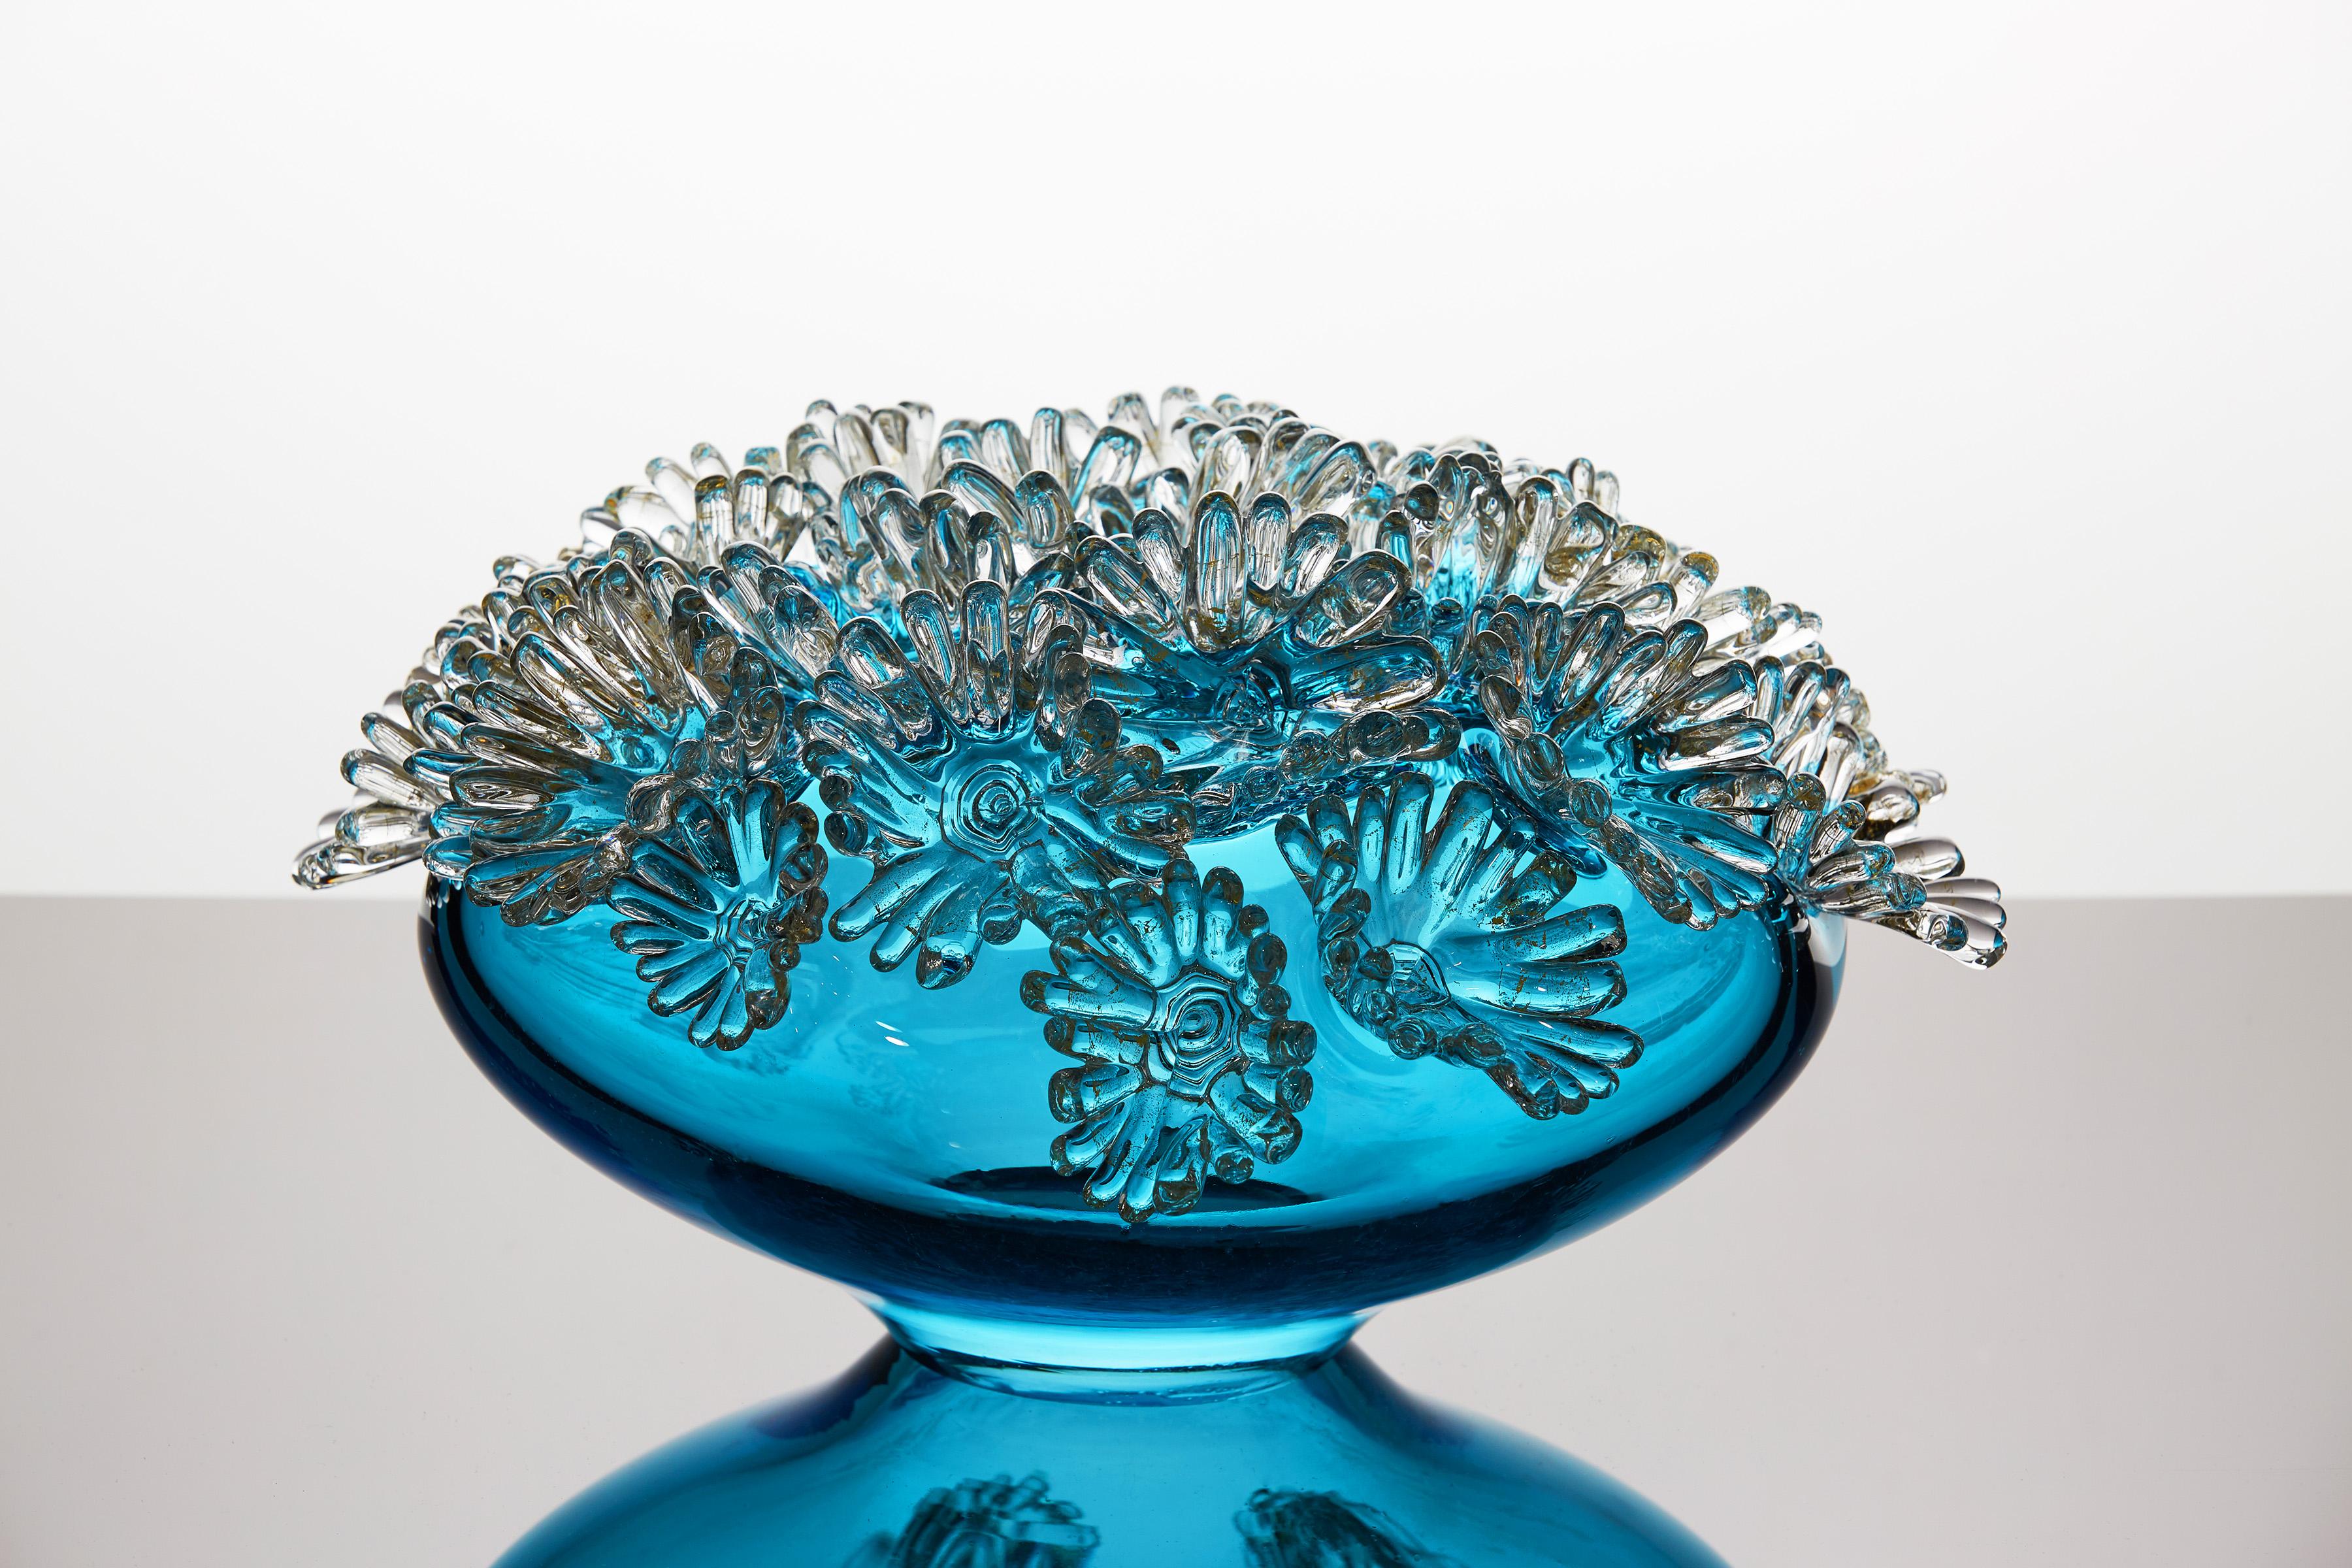 Kiara Pelissier- Copper Blue Coral Polyp